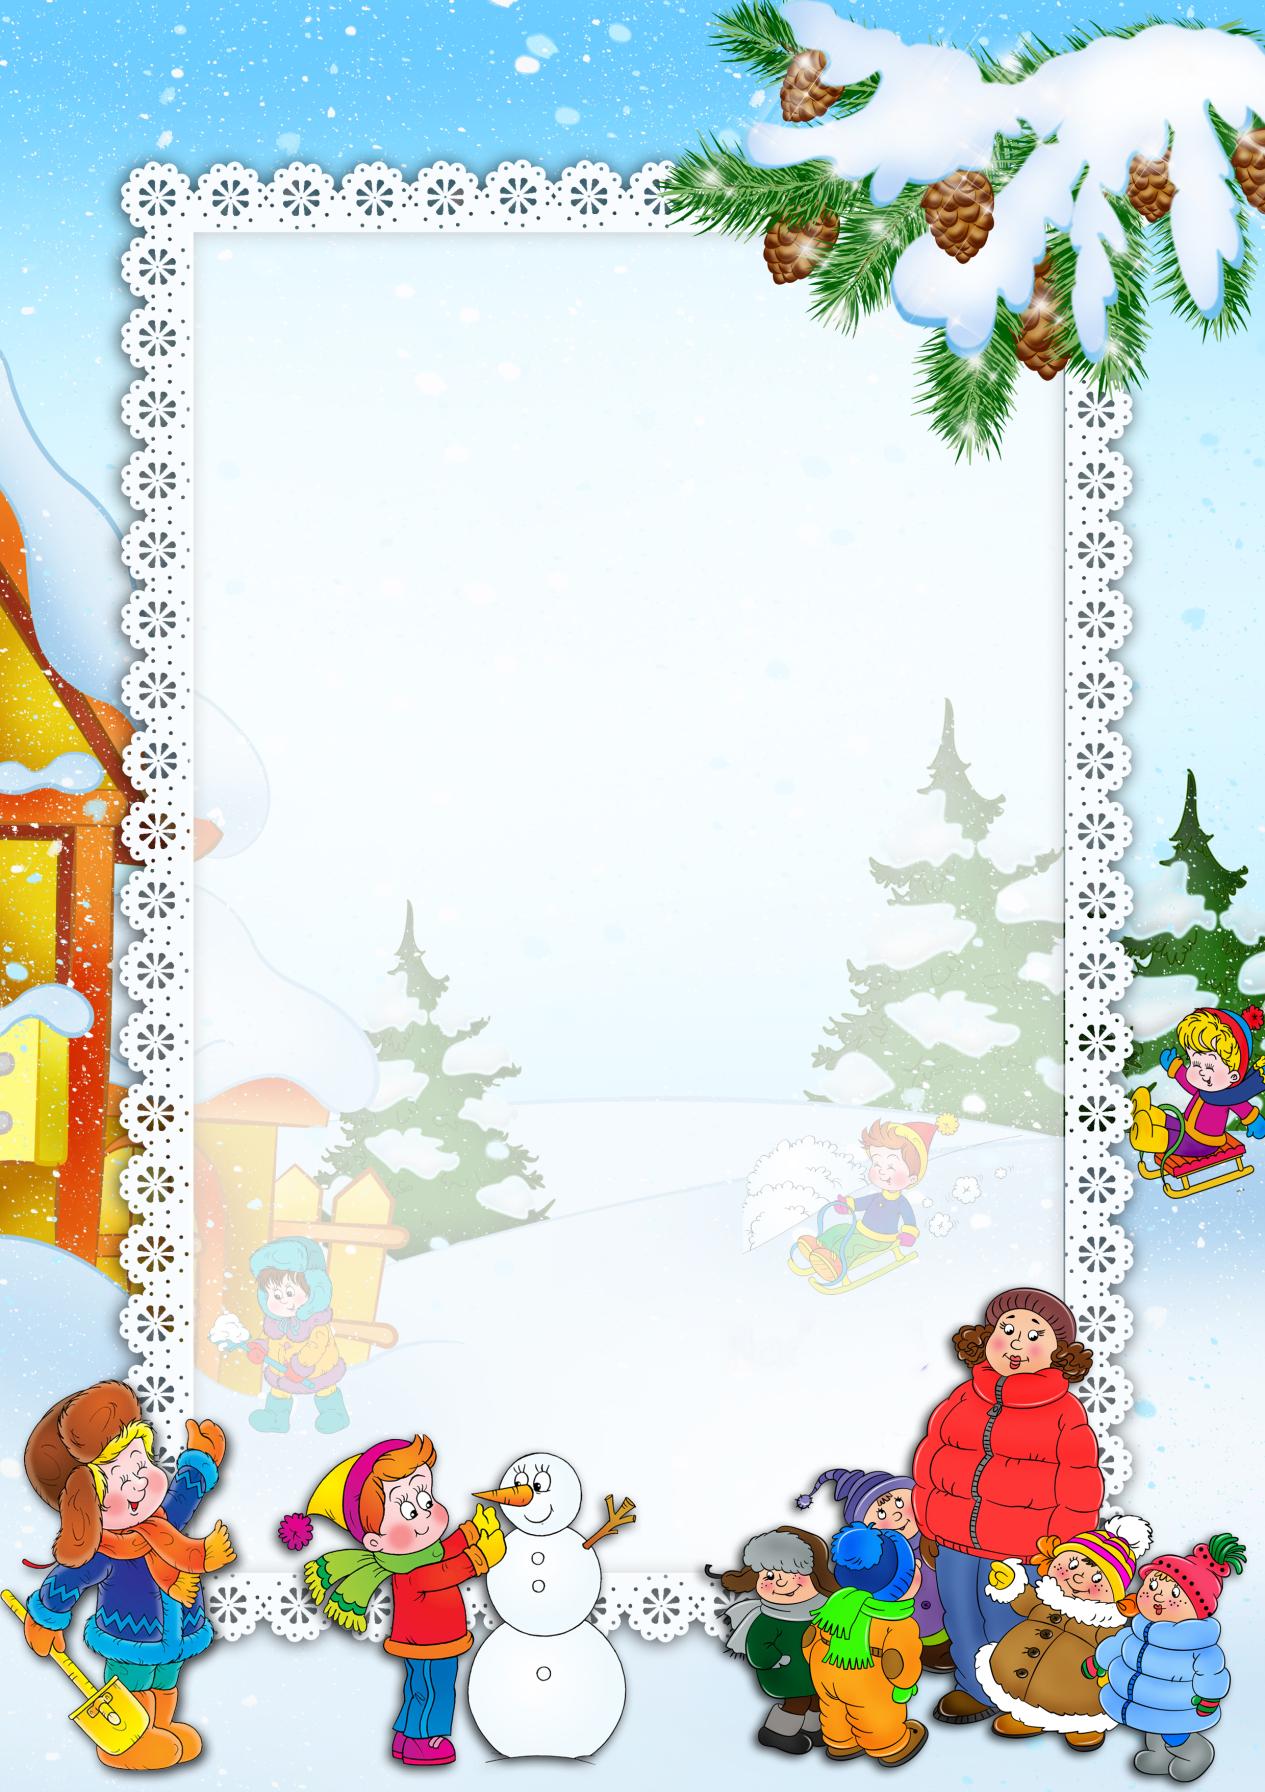 картинки на шафи в дитячому садку полнокадровых камерах